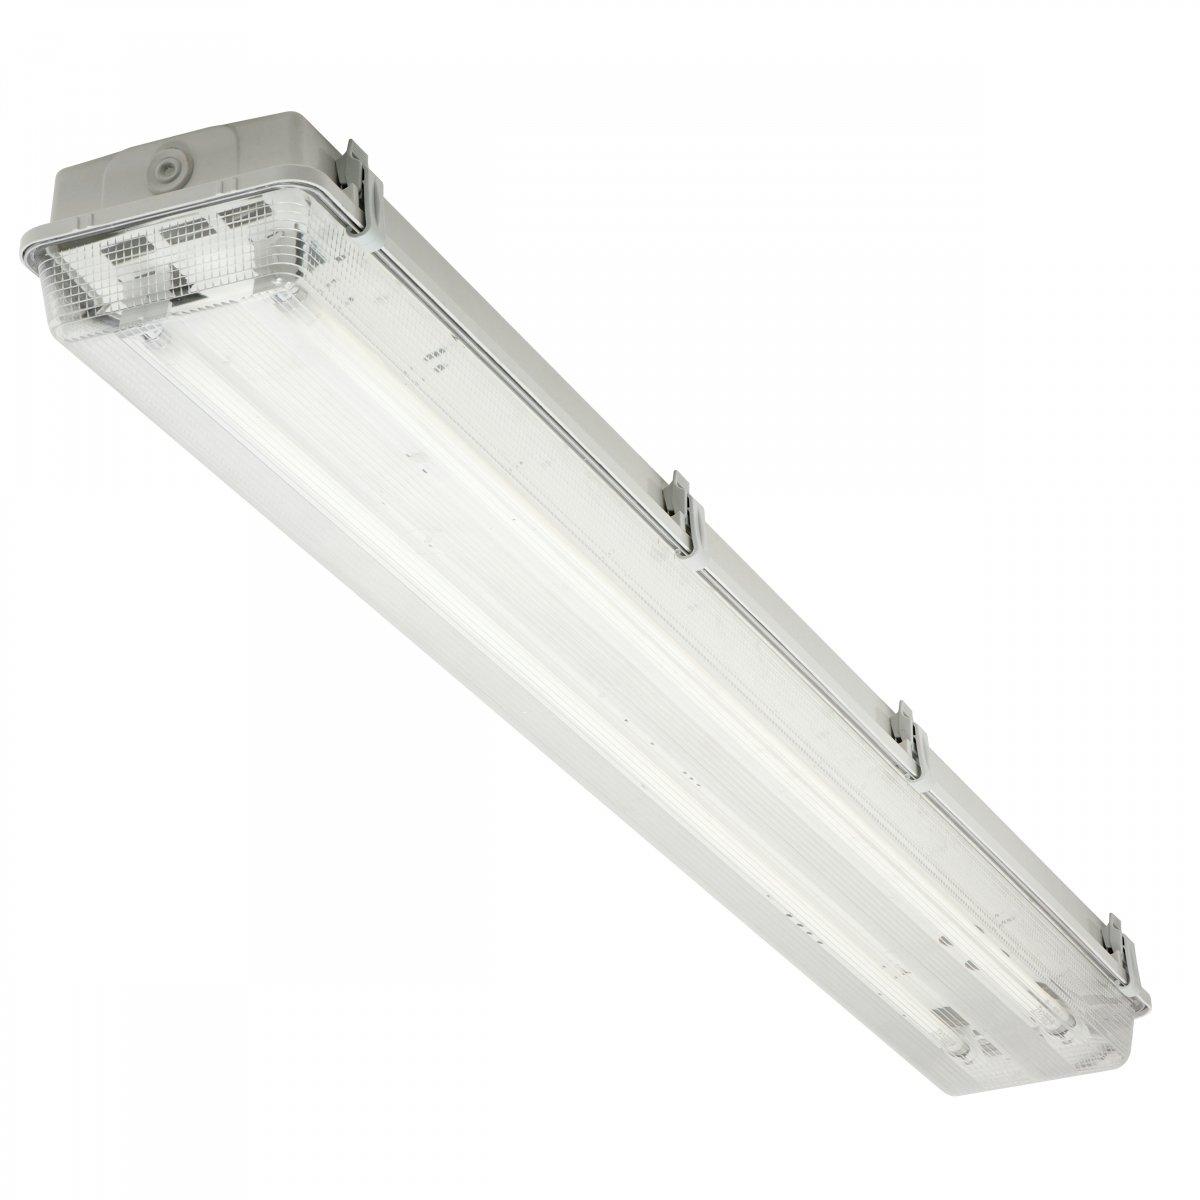 Fluorescent Light Fixture Retainer Clips Lighting Designs